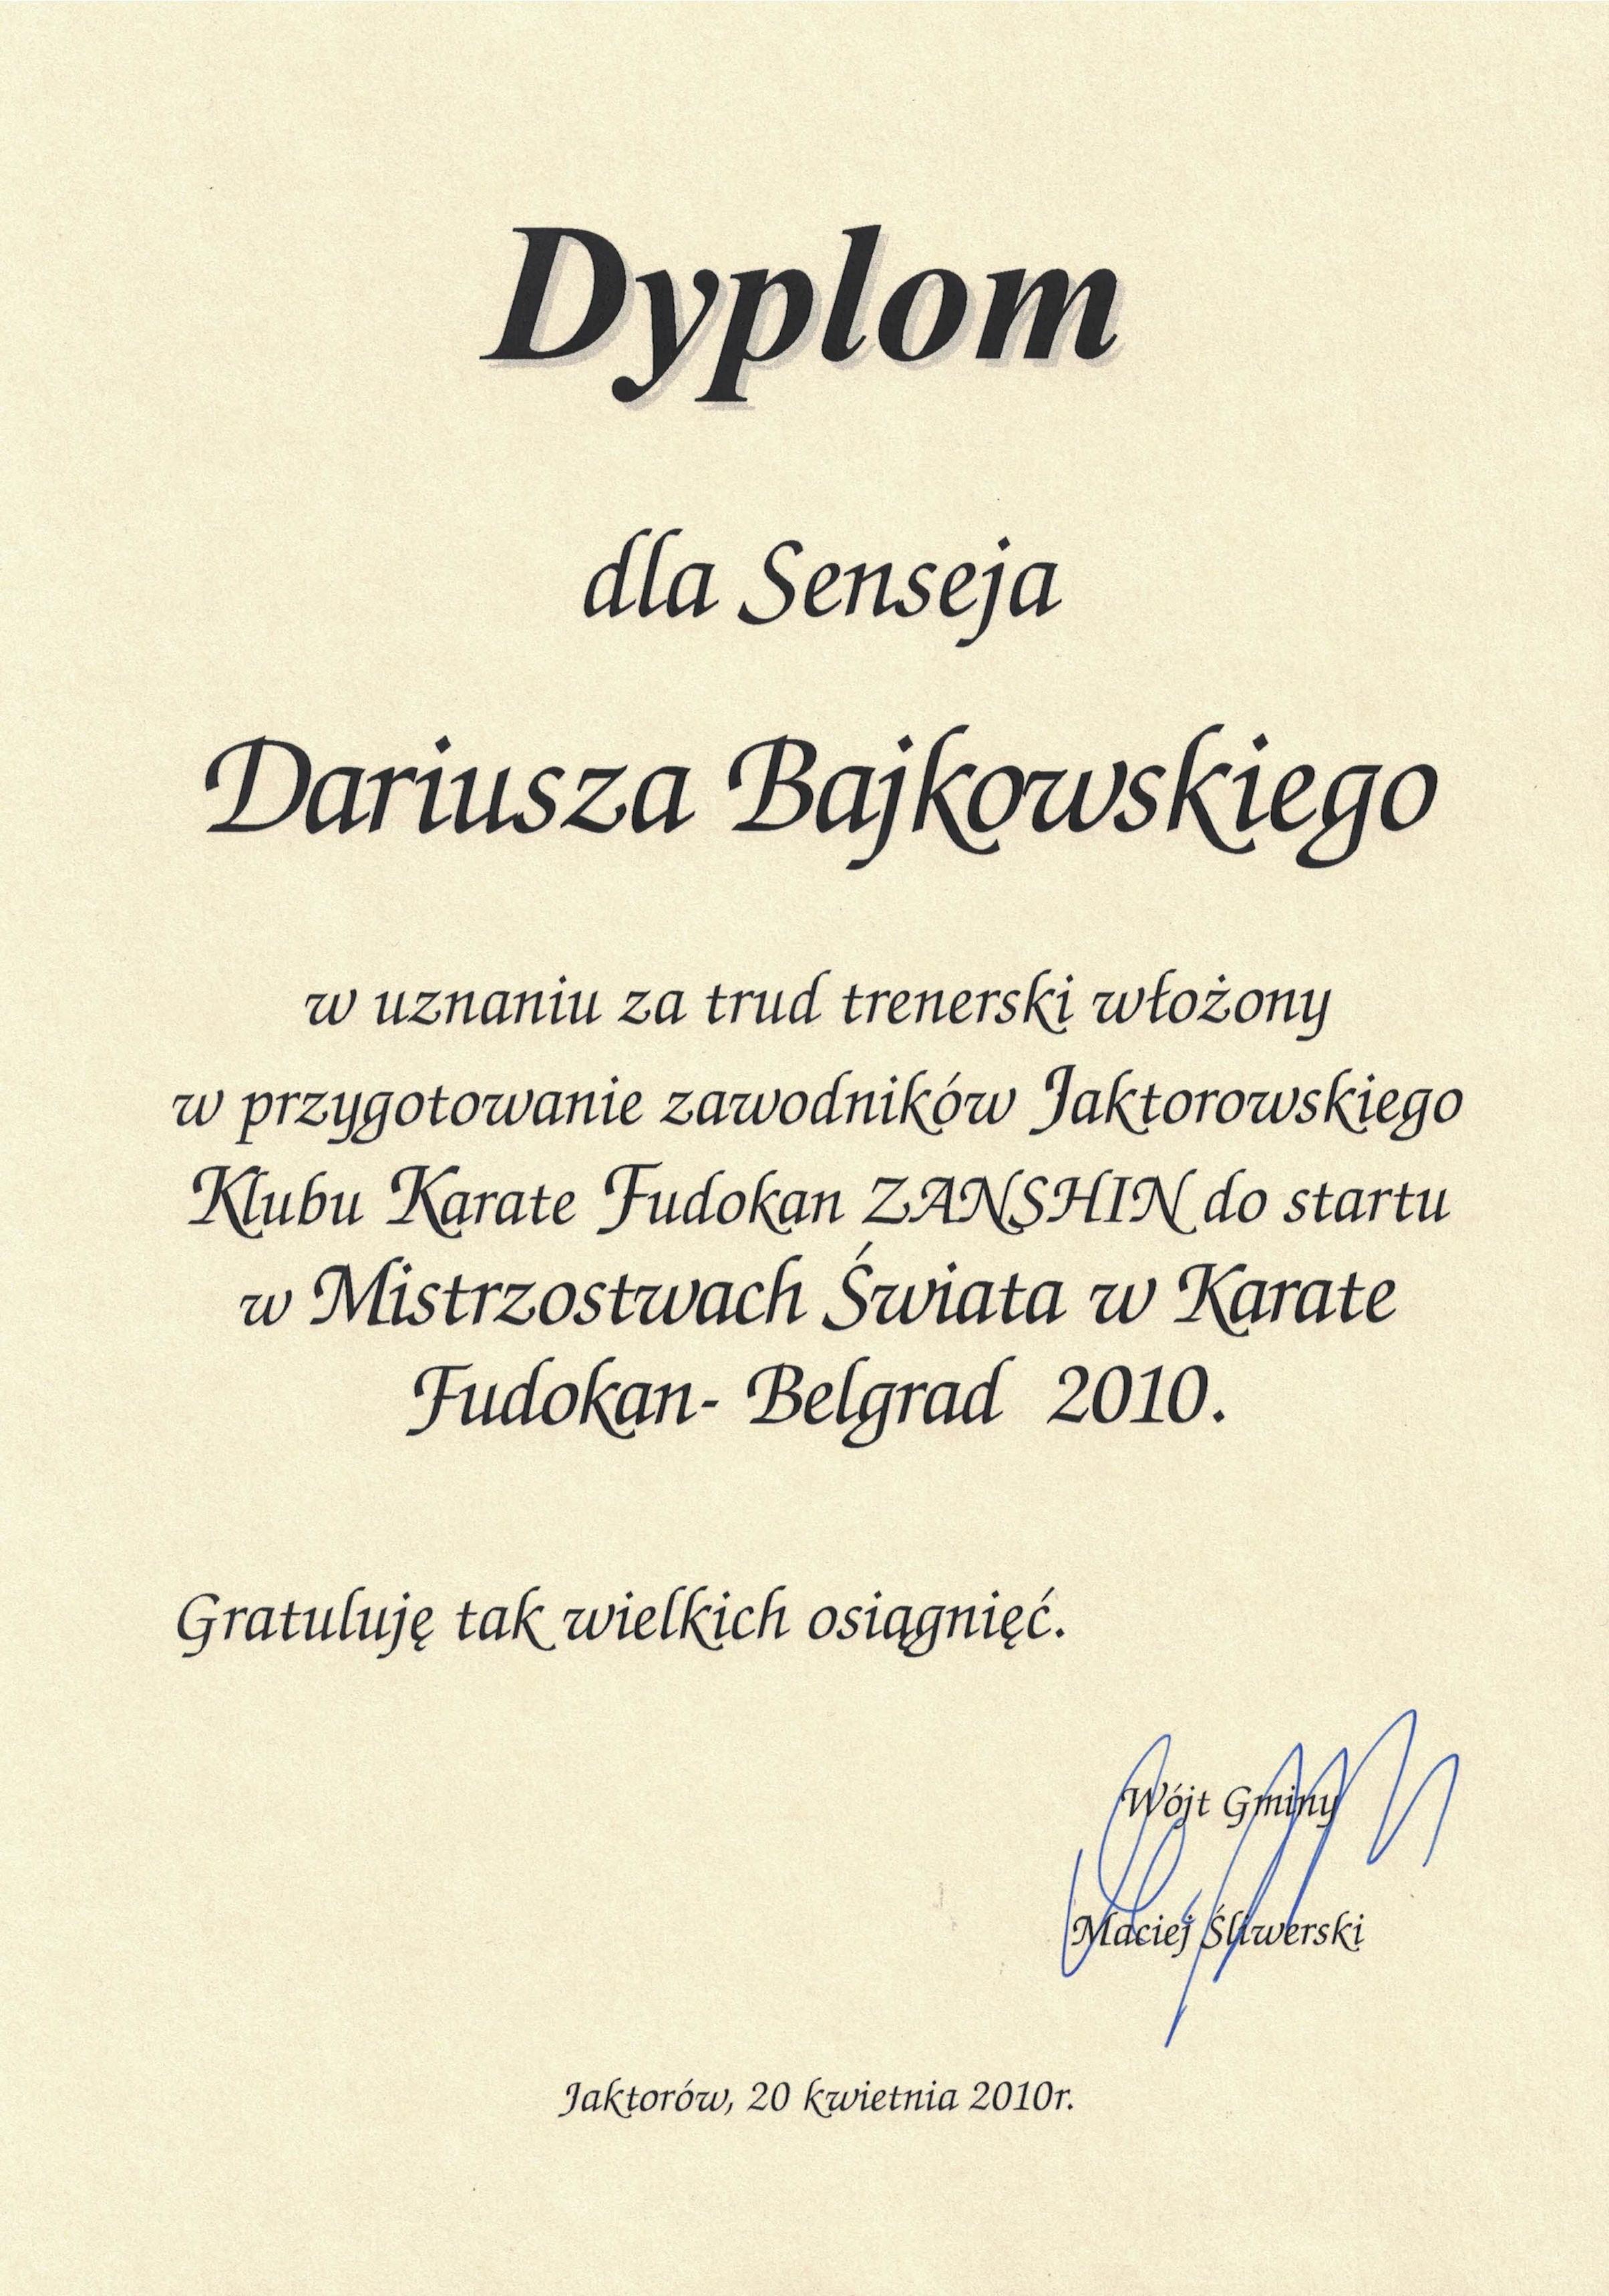 Dariusz-Bajkowski-Jaktorow-0